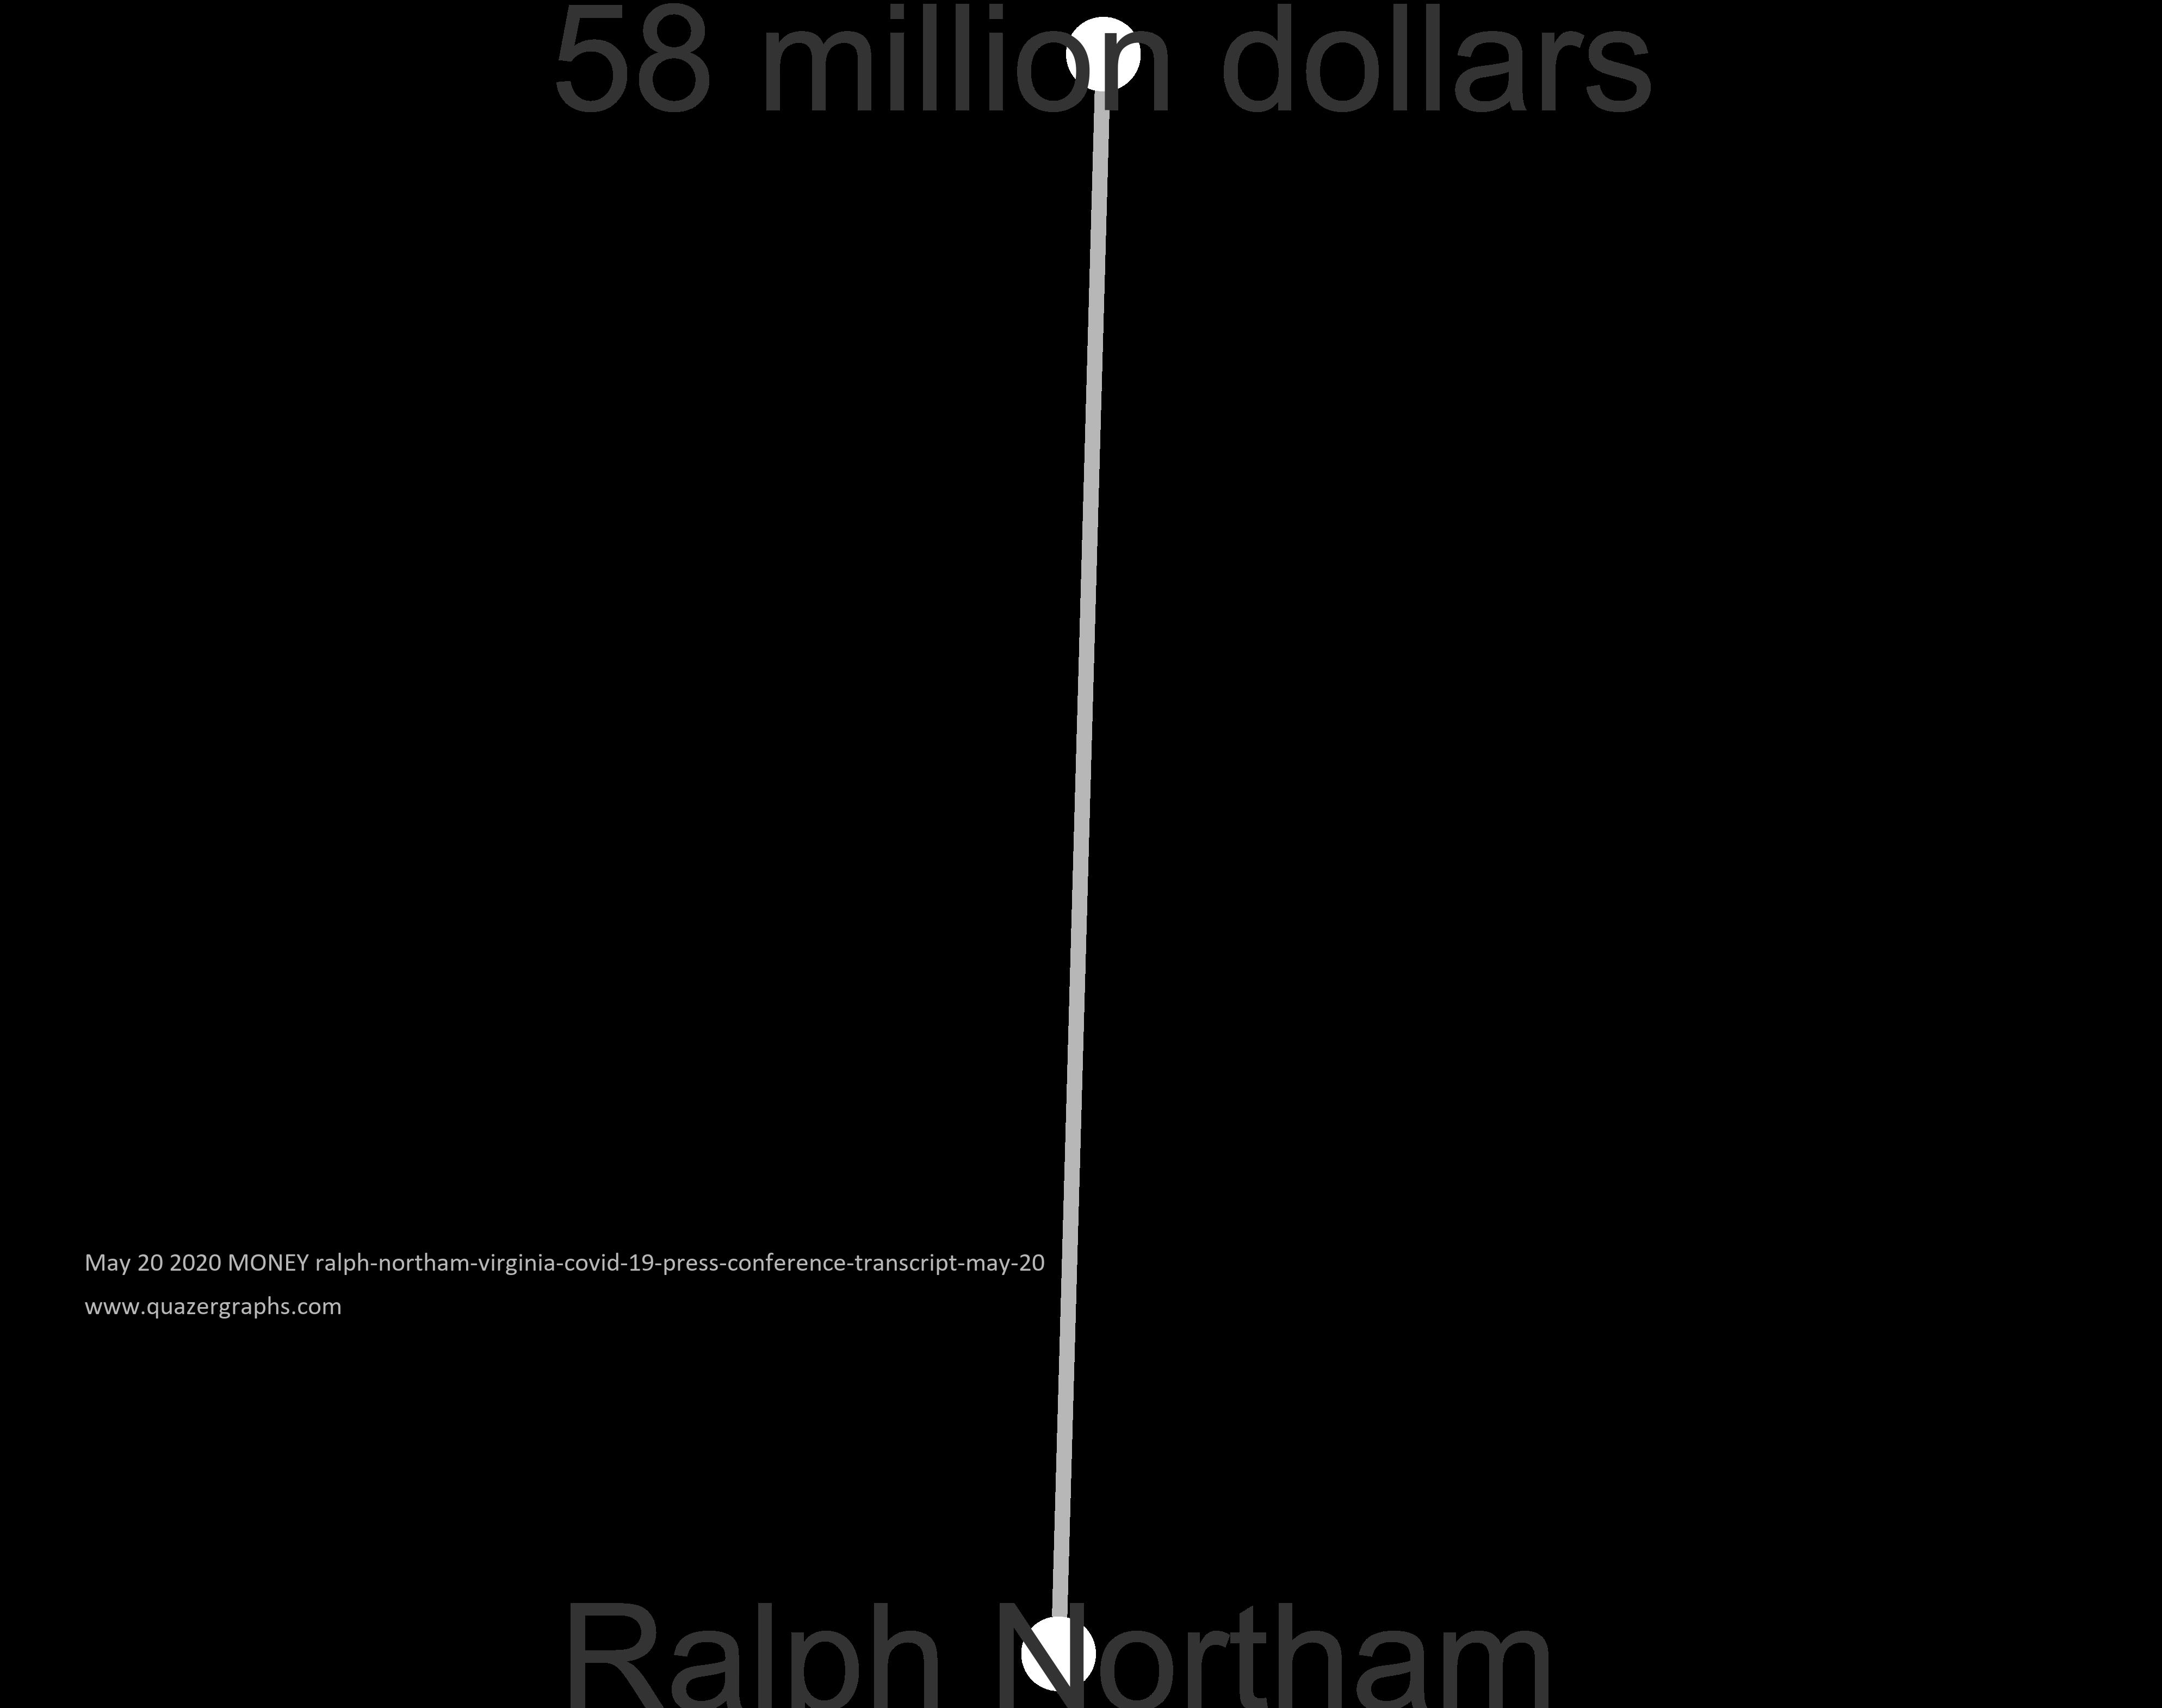 May 20 2020 MONEY ralph-northam-virginia-covid-19-press-conference-transcript-may-20